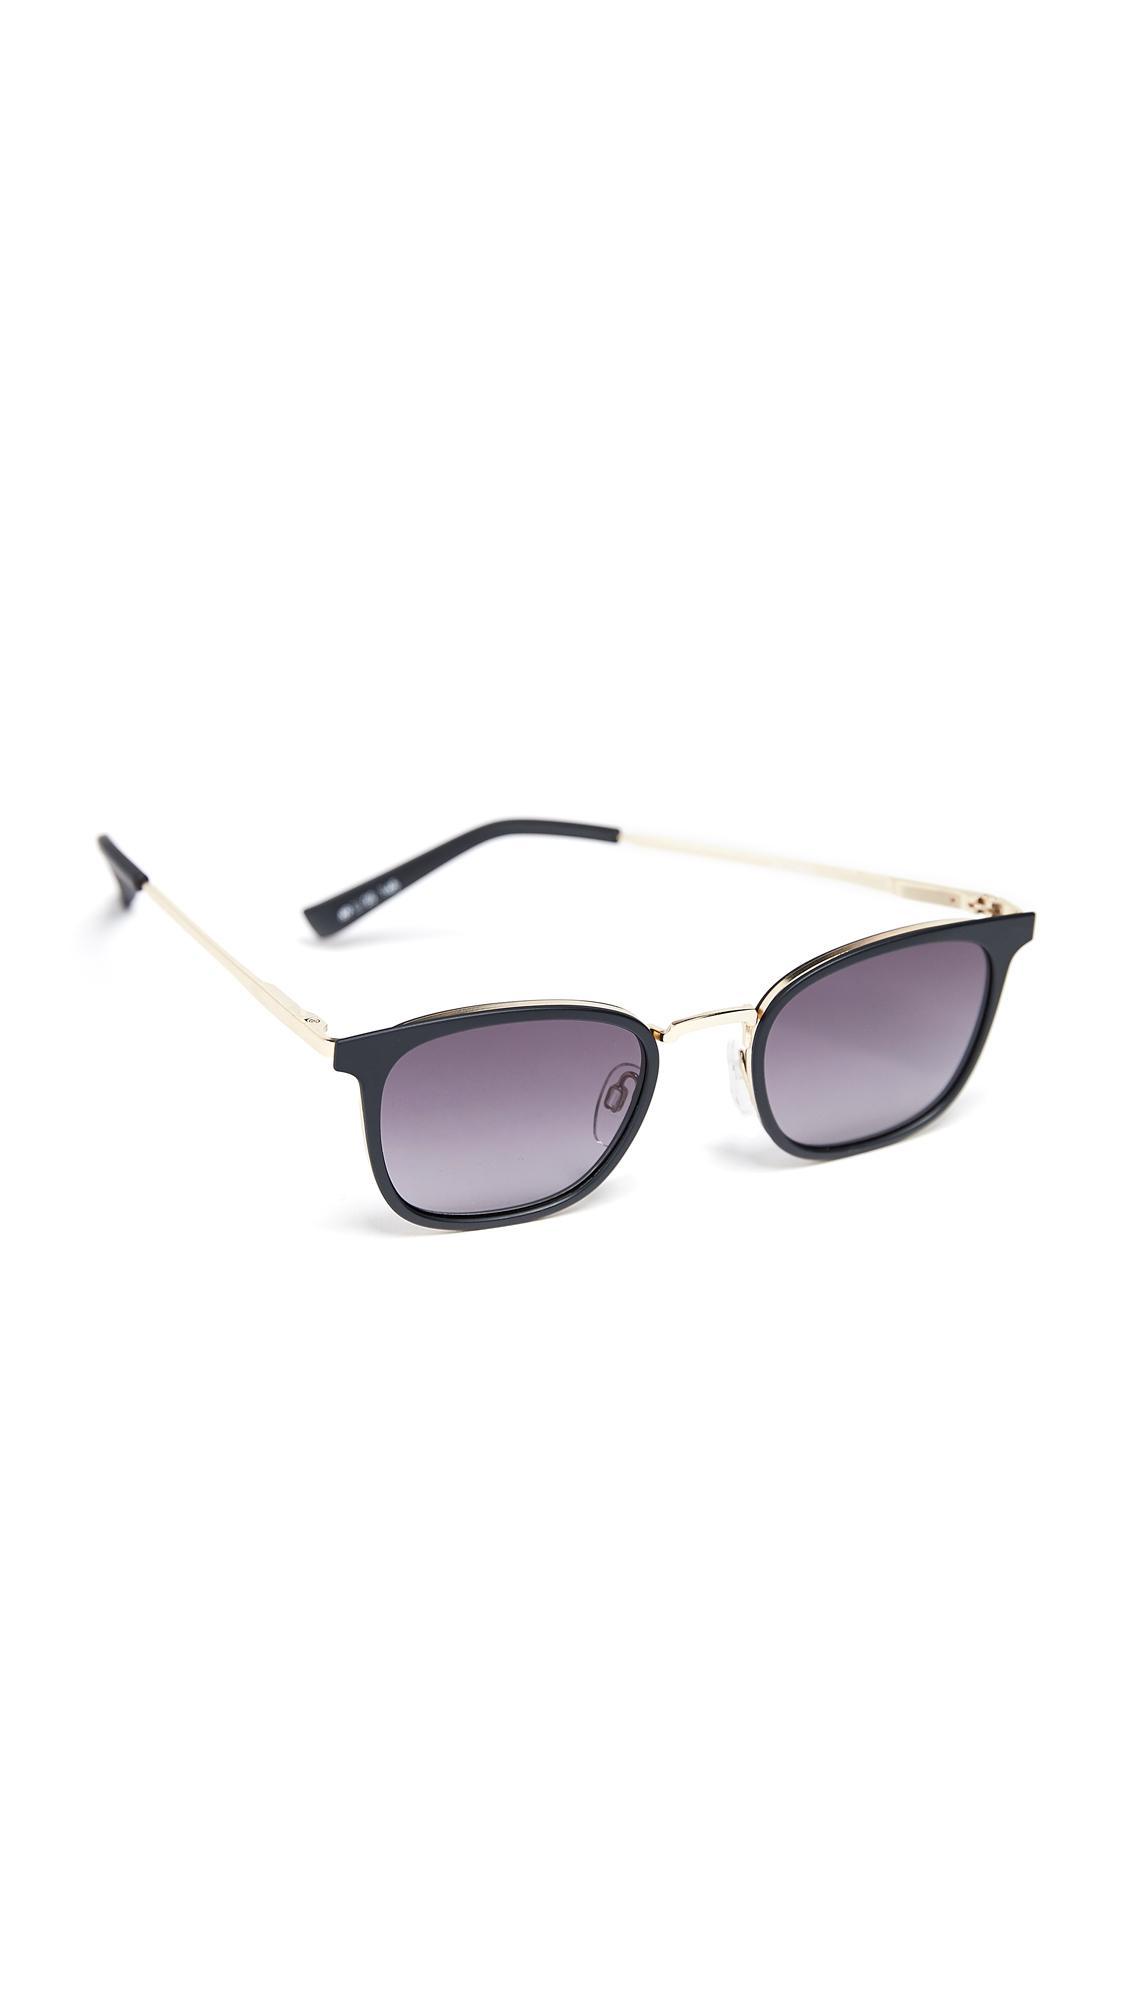 Le Specs Racketeer Sunglasses In Matte Black